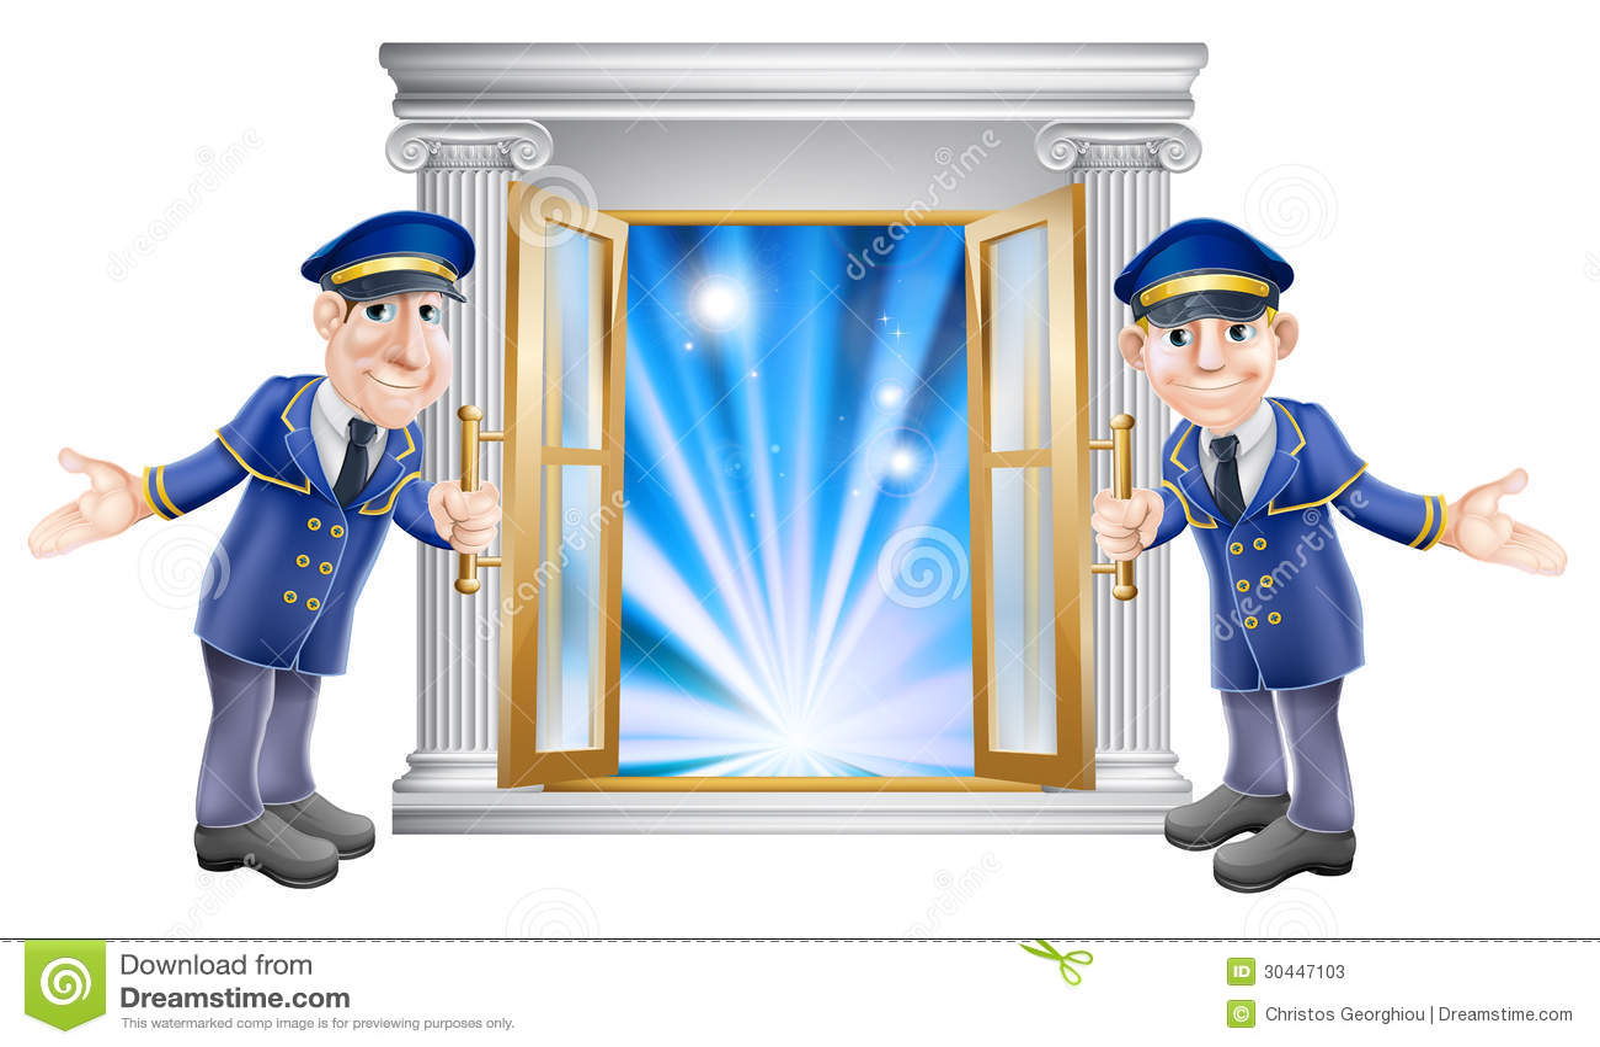 vip doormen and entrance door stock vector image 30447103. Black Bedroom Furniture Sets. Home Design Ideas